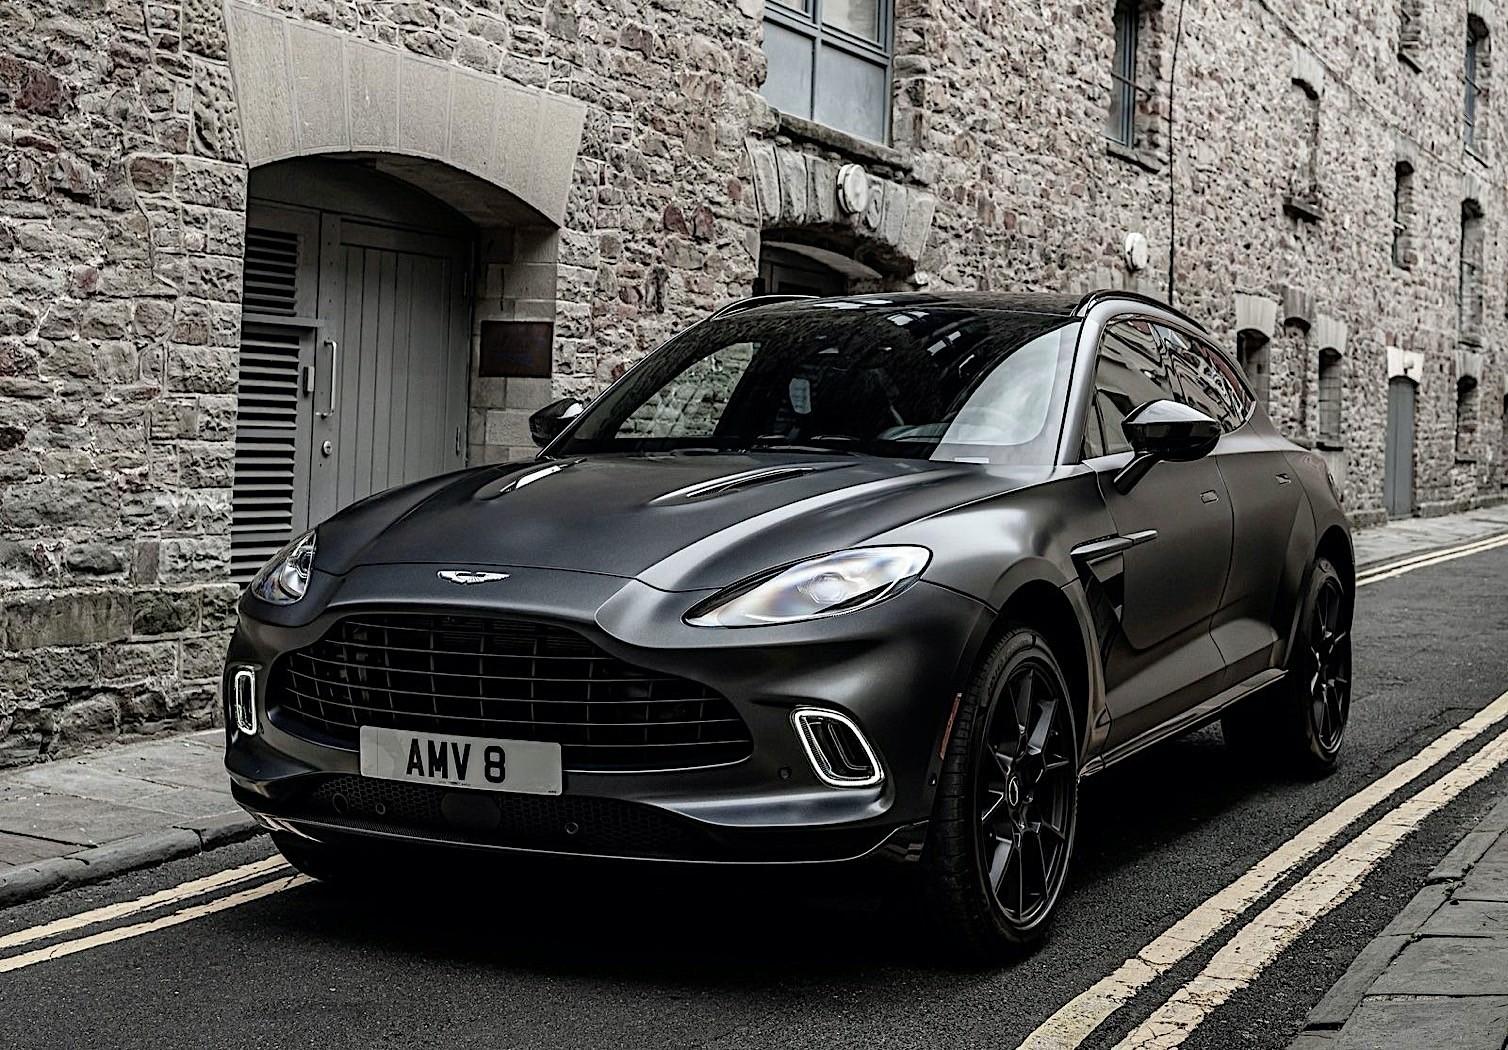 Colorful Aston Martin Dbx Looks Like The Proper Suv For The Future James Bond Autoevolution